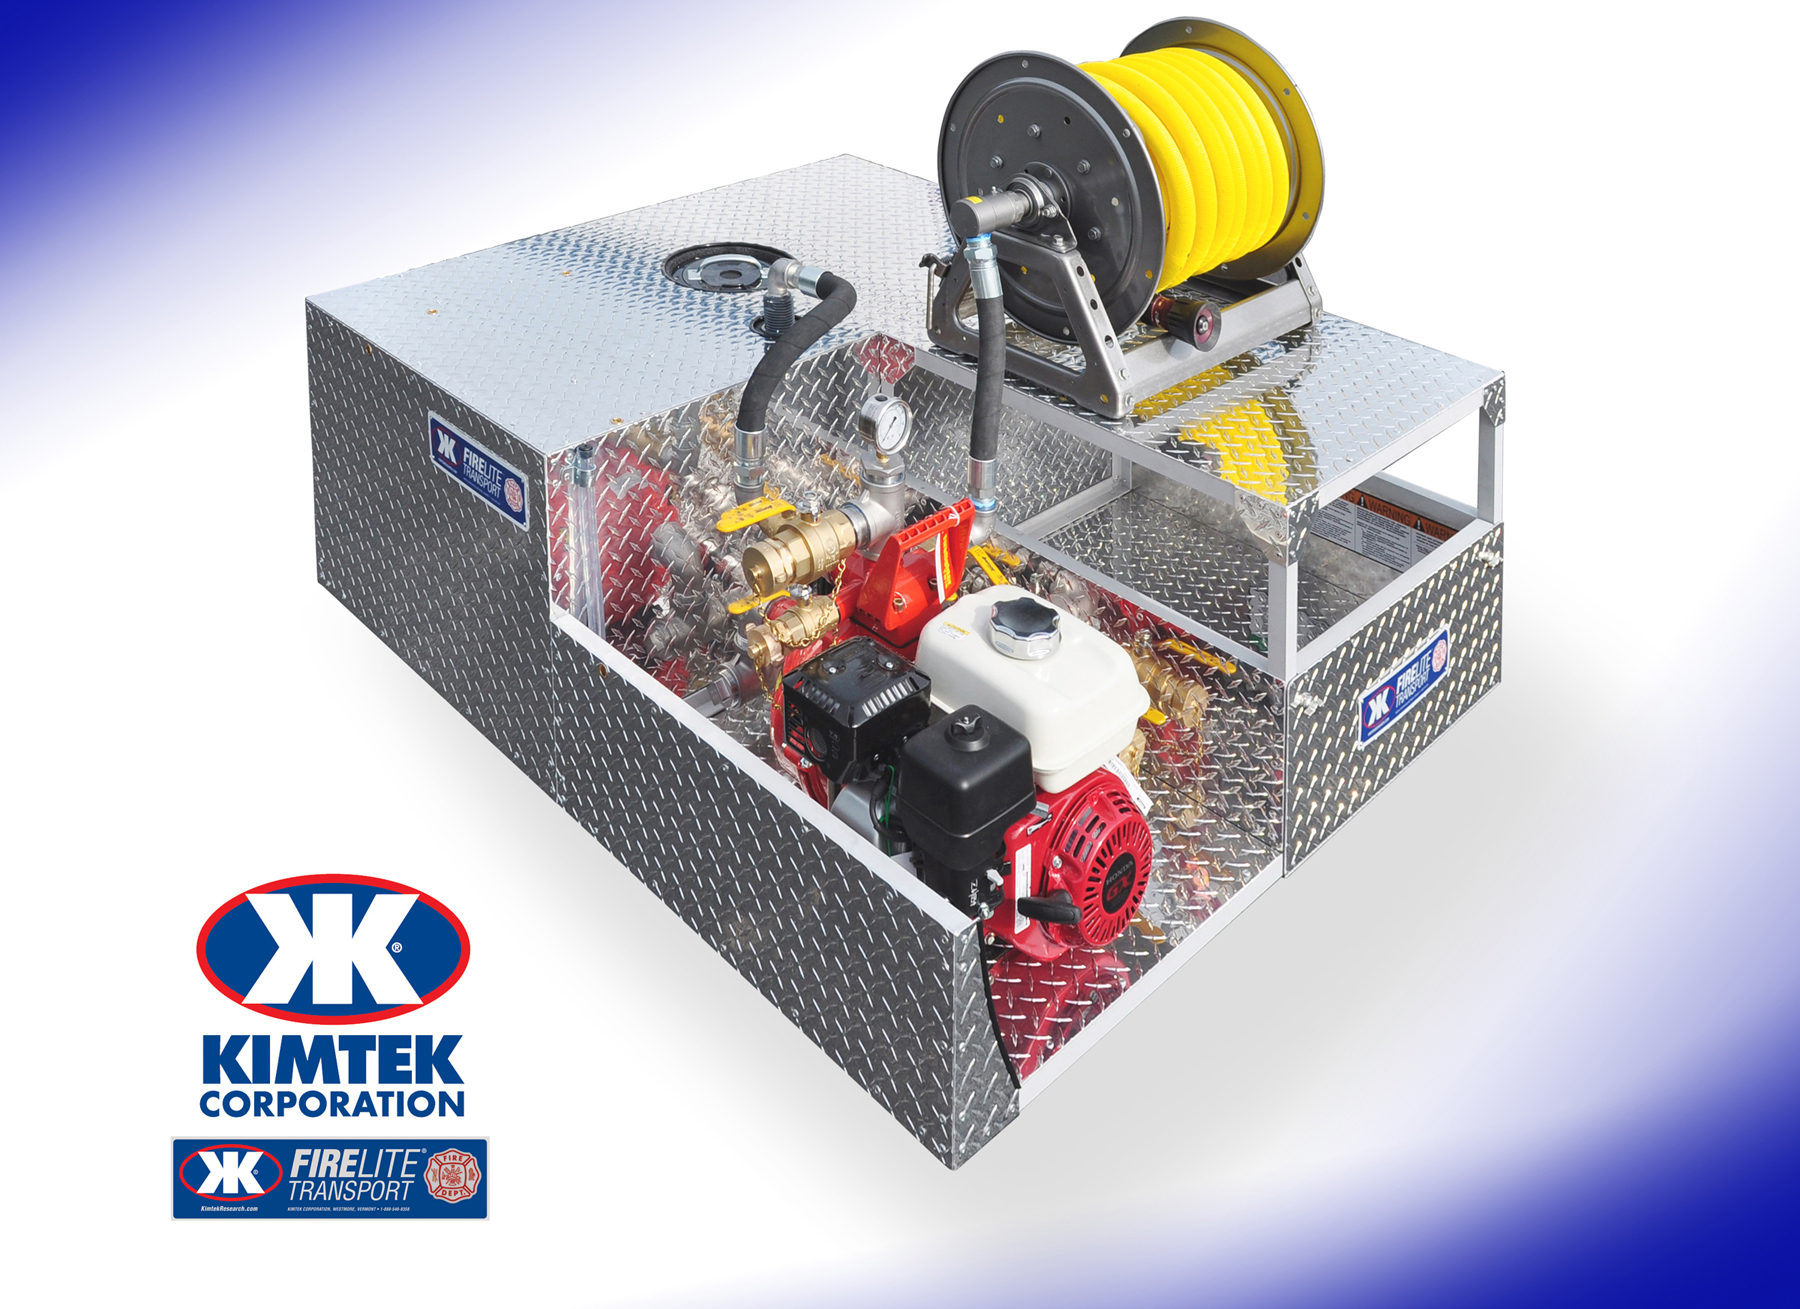 Kimtek FIRELITE FHR-205